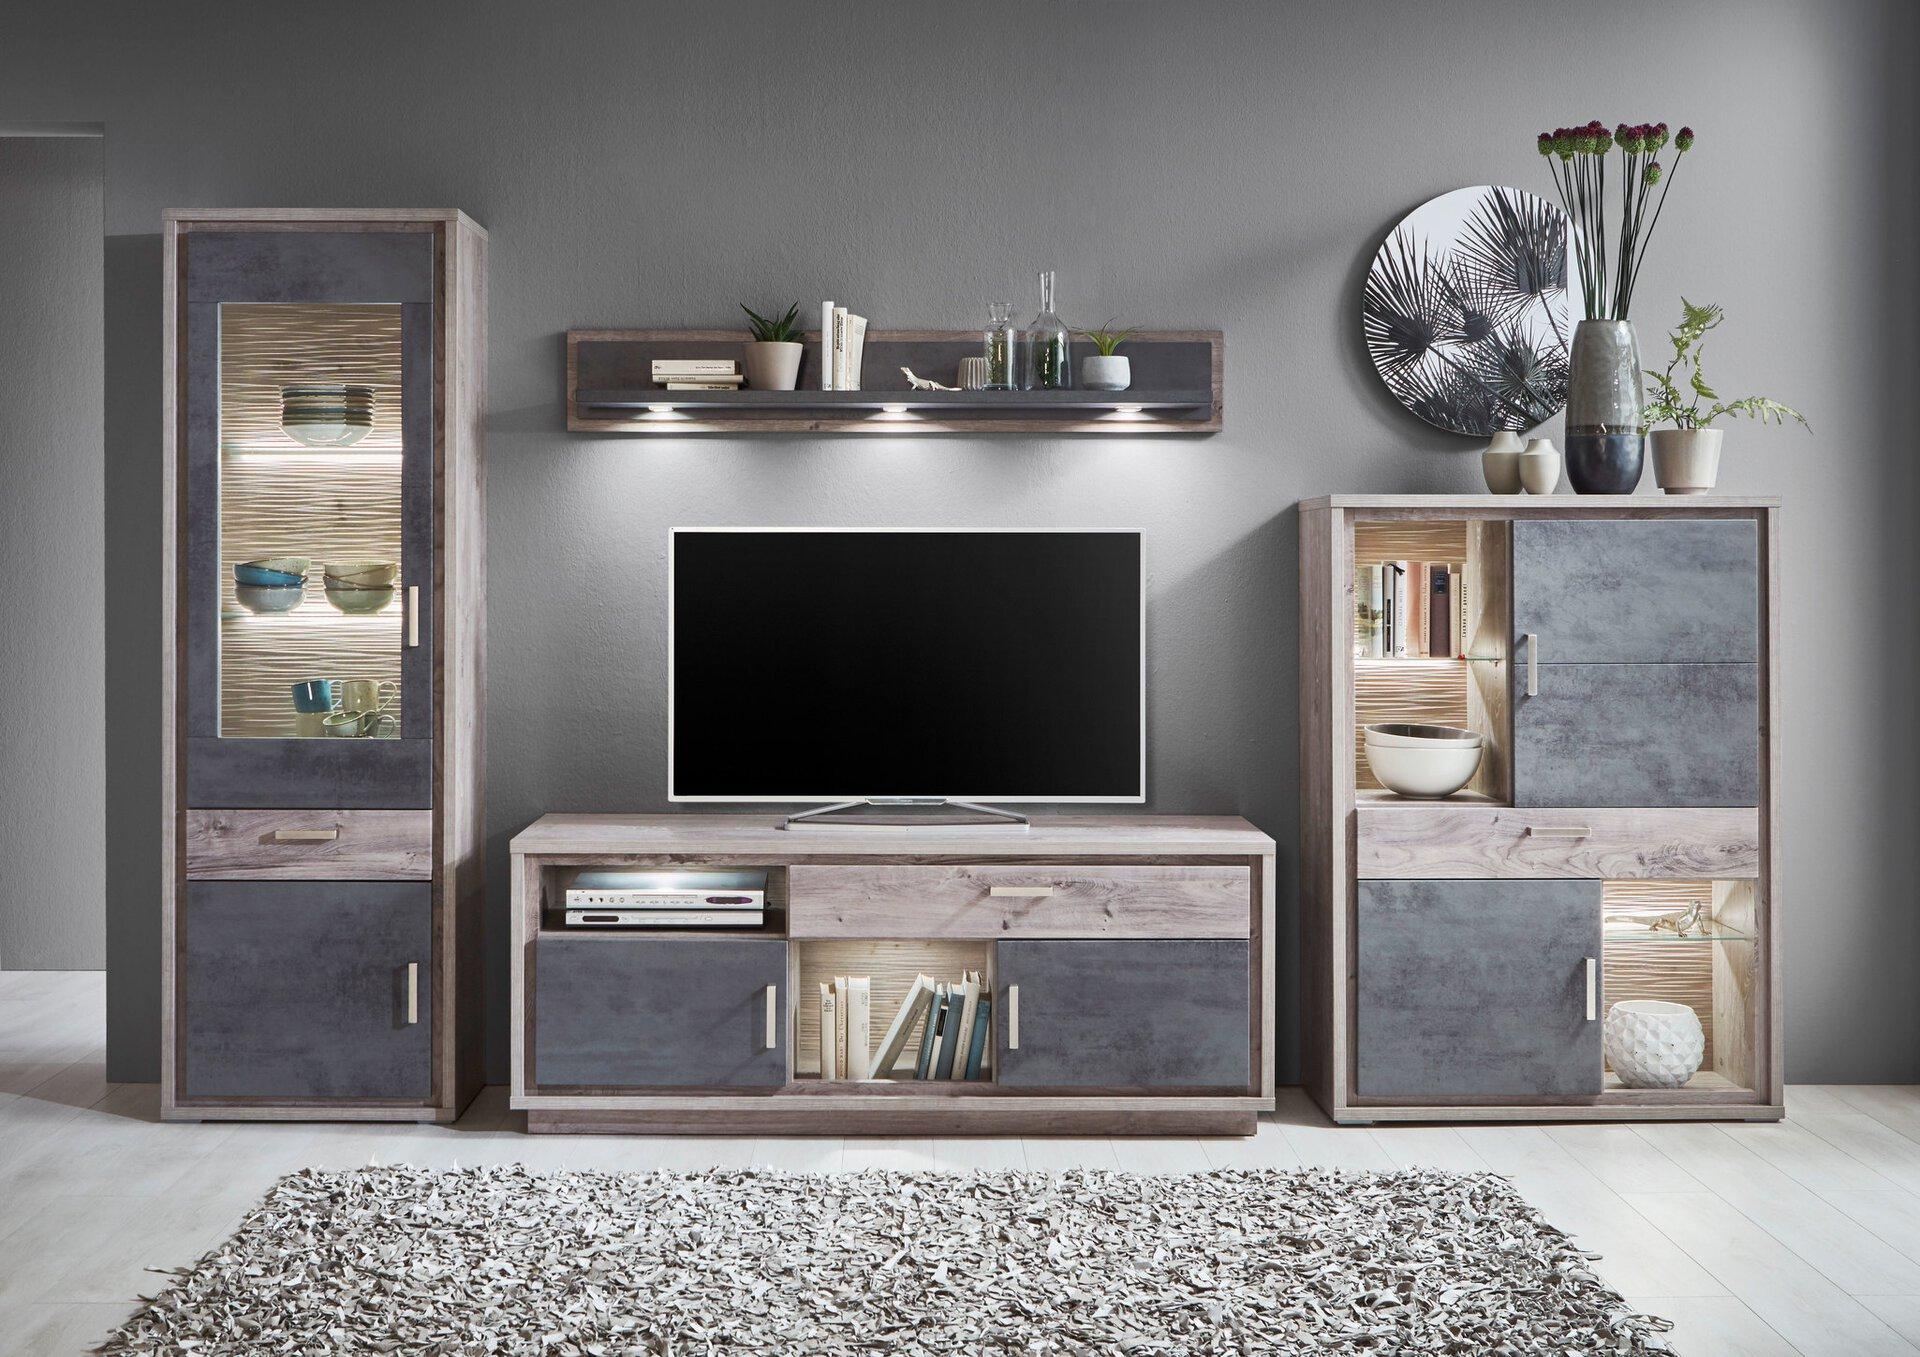 Wohnwand ASSET Vito Holzwerkstoff 50 x 204 x 352 cm